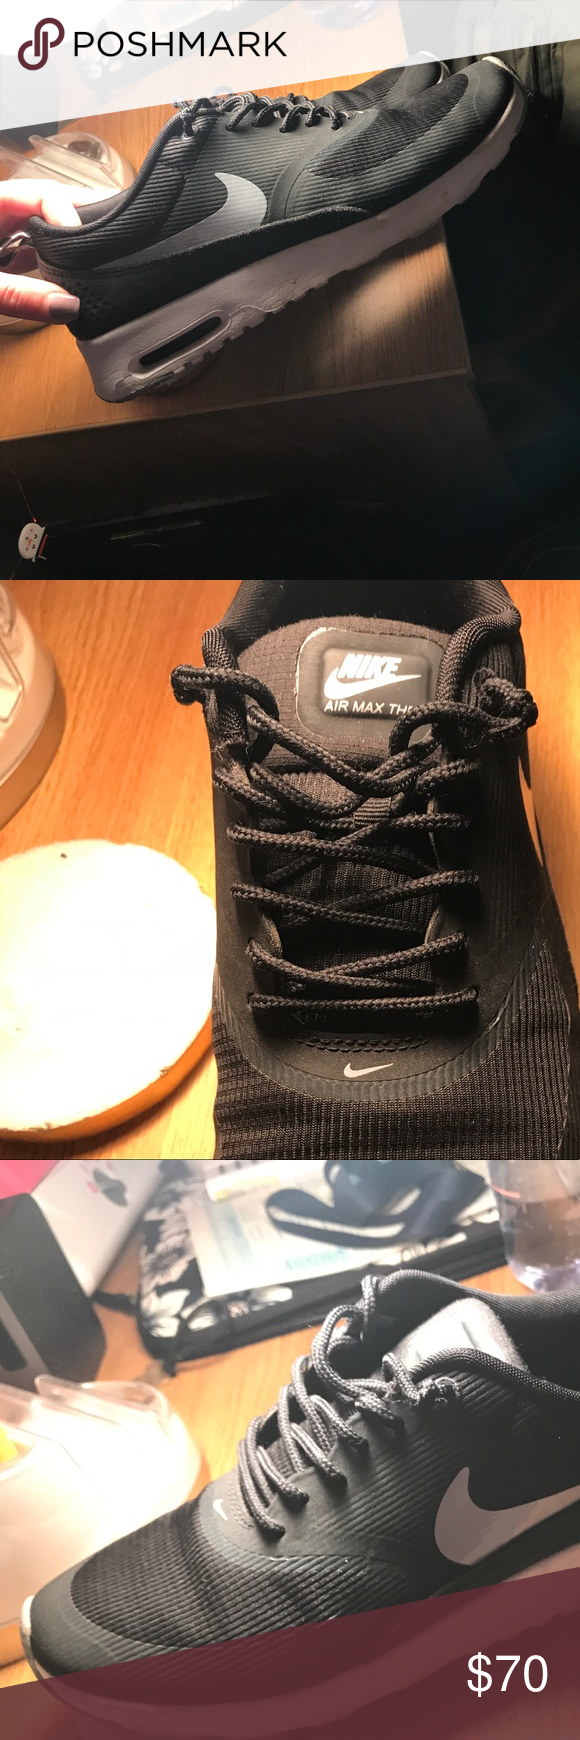 pretty nice 62db2 533f7 3 Best Nike Air Max 97 Sneakers (January 2018) RunRepeat